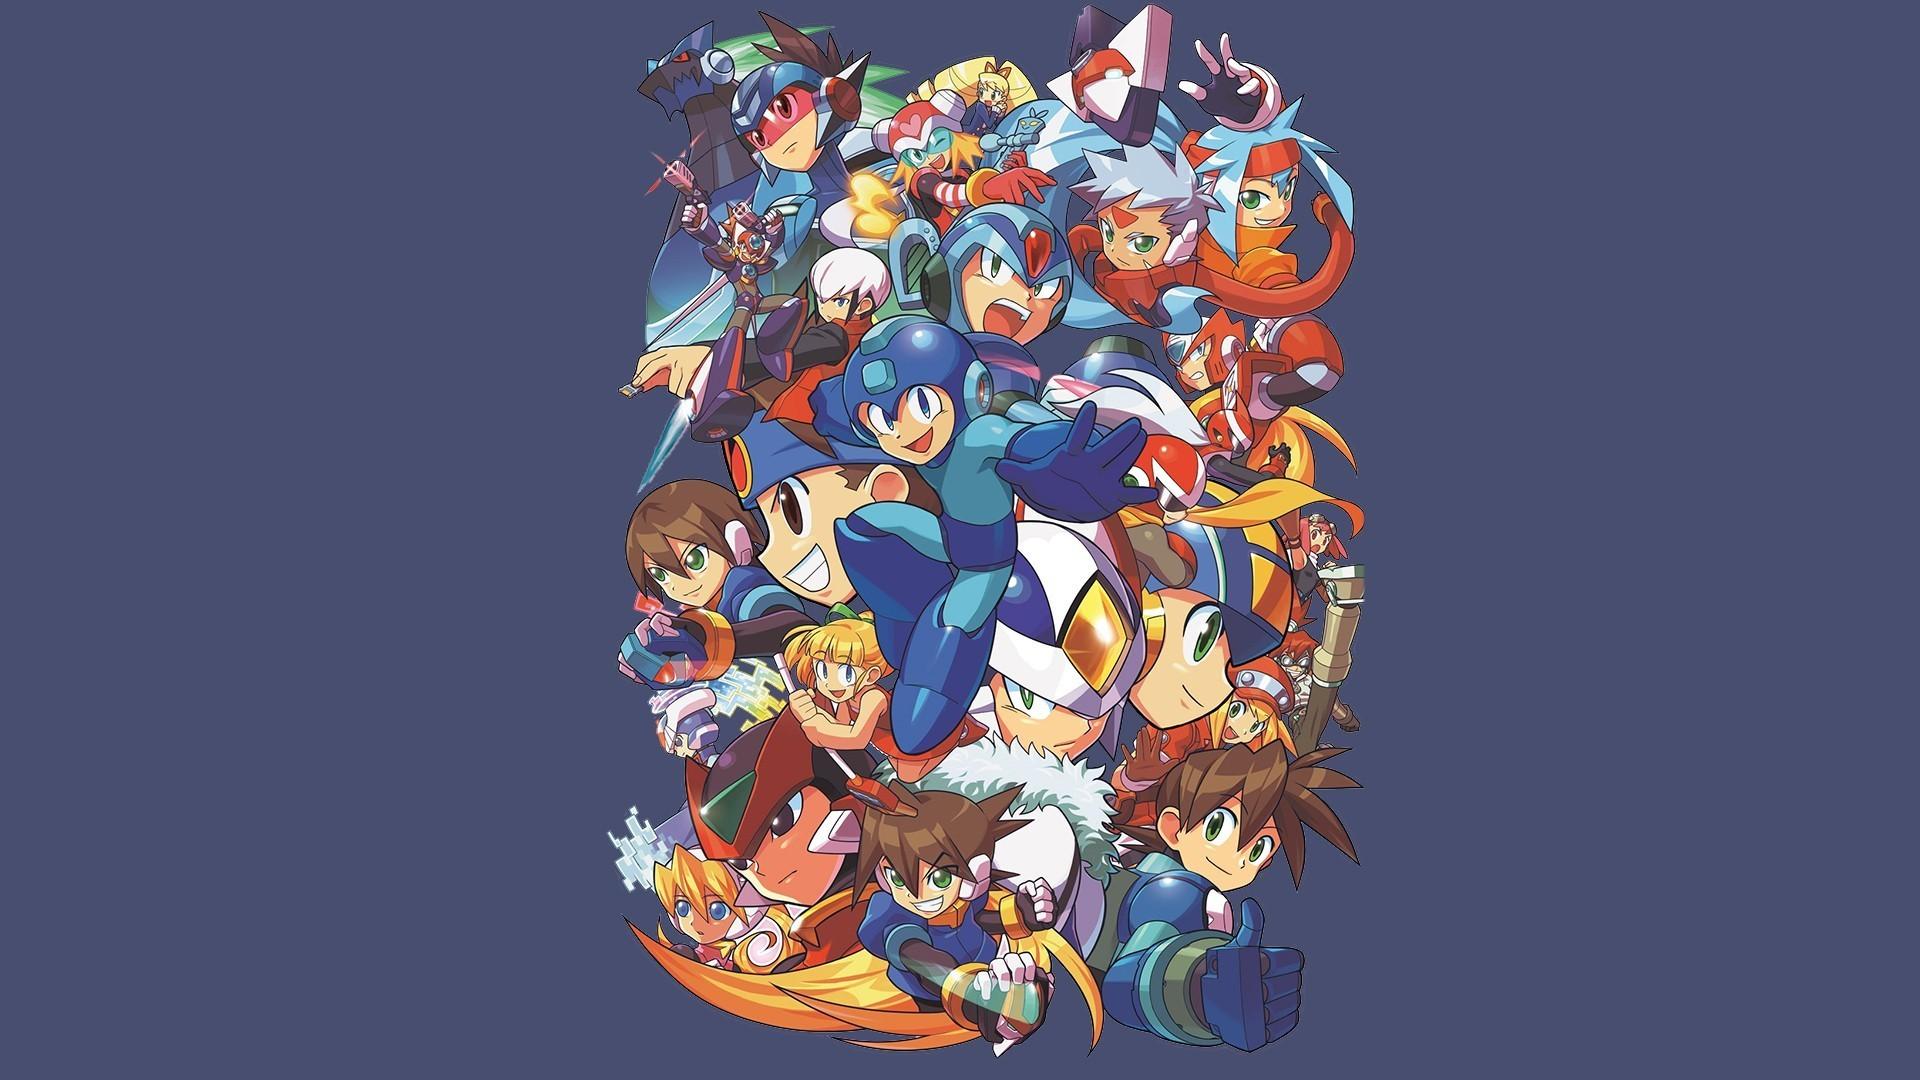 Mobile Wallpaper Inspirational Quotes Megaman Wallpaper Hd Pixelstalk Net